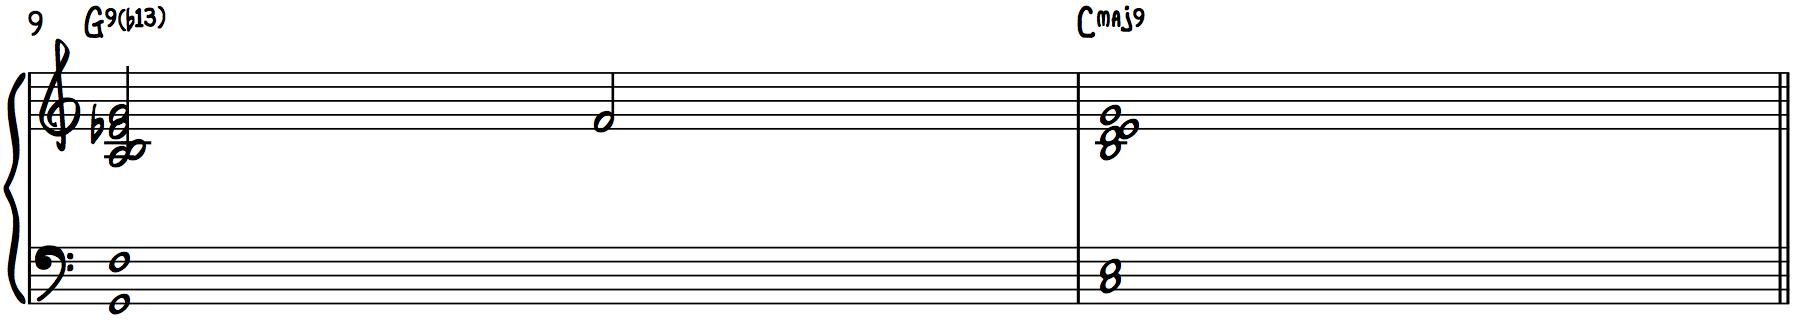 Stride Chords (b13 Chords) ragtime left hand